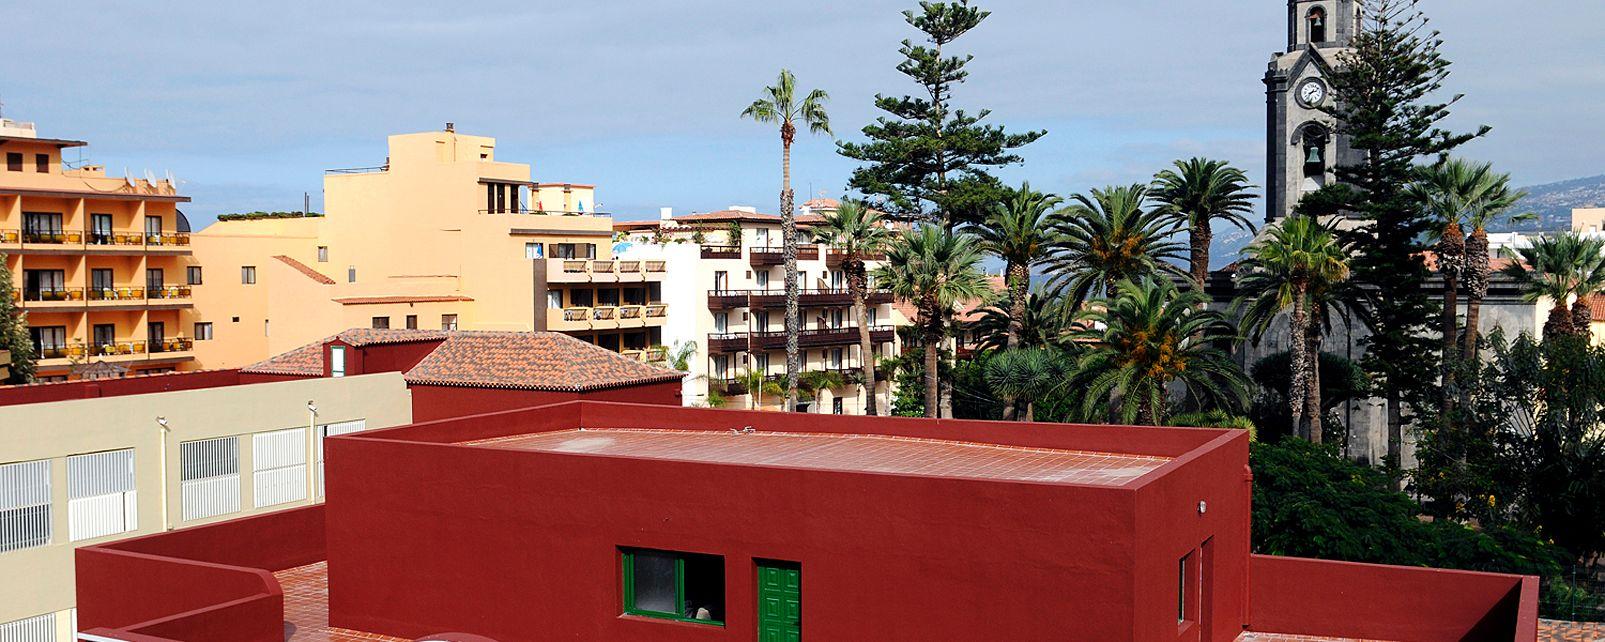 Hotel Chimisay